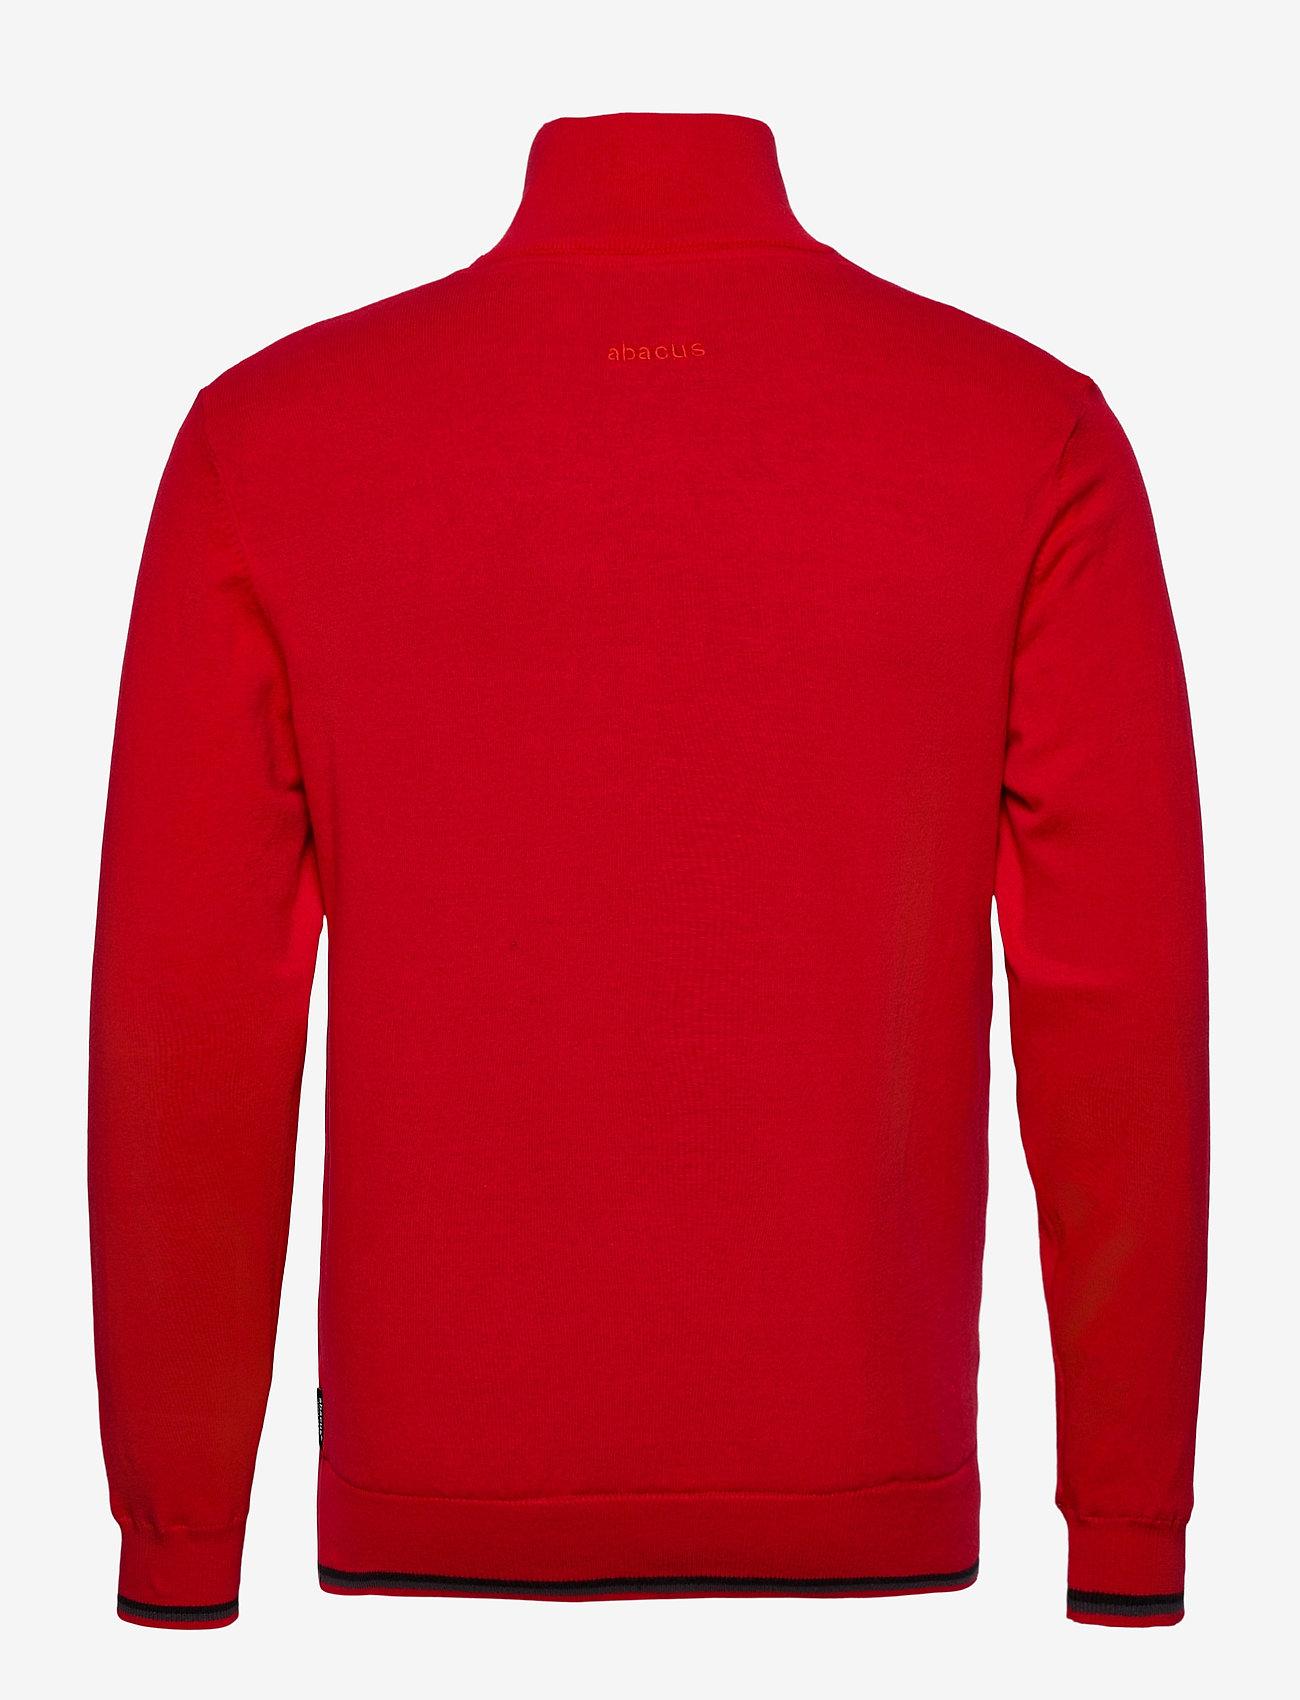 Abacus Mens Dubson windstop pullover - Strikkevarer RED - Menn Klær